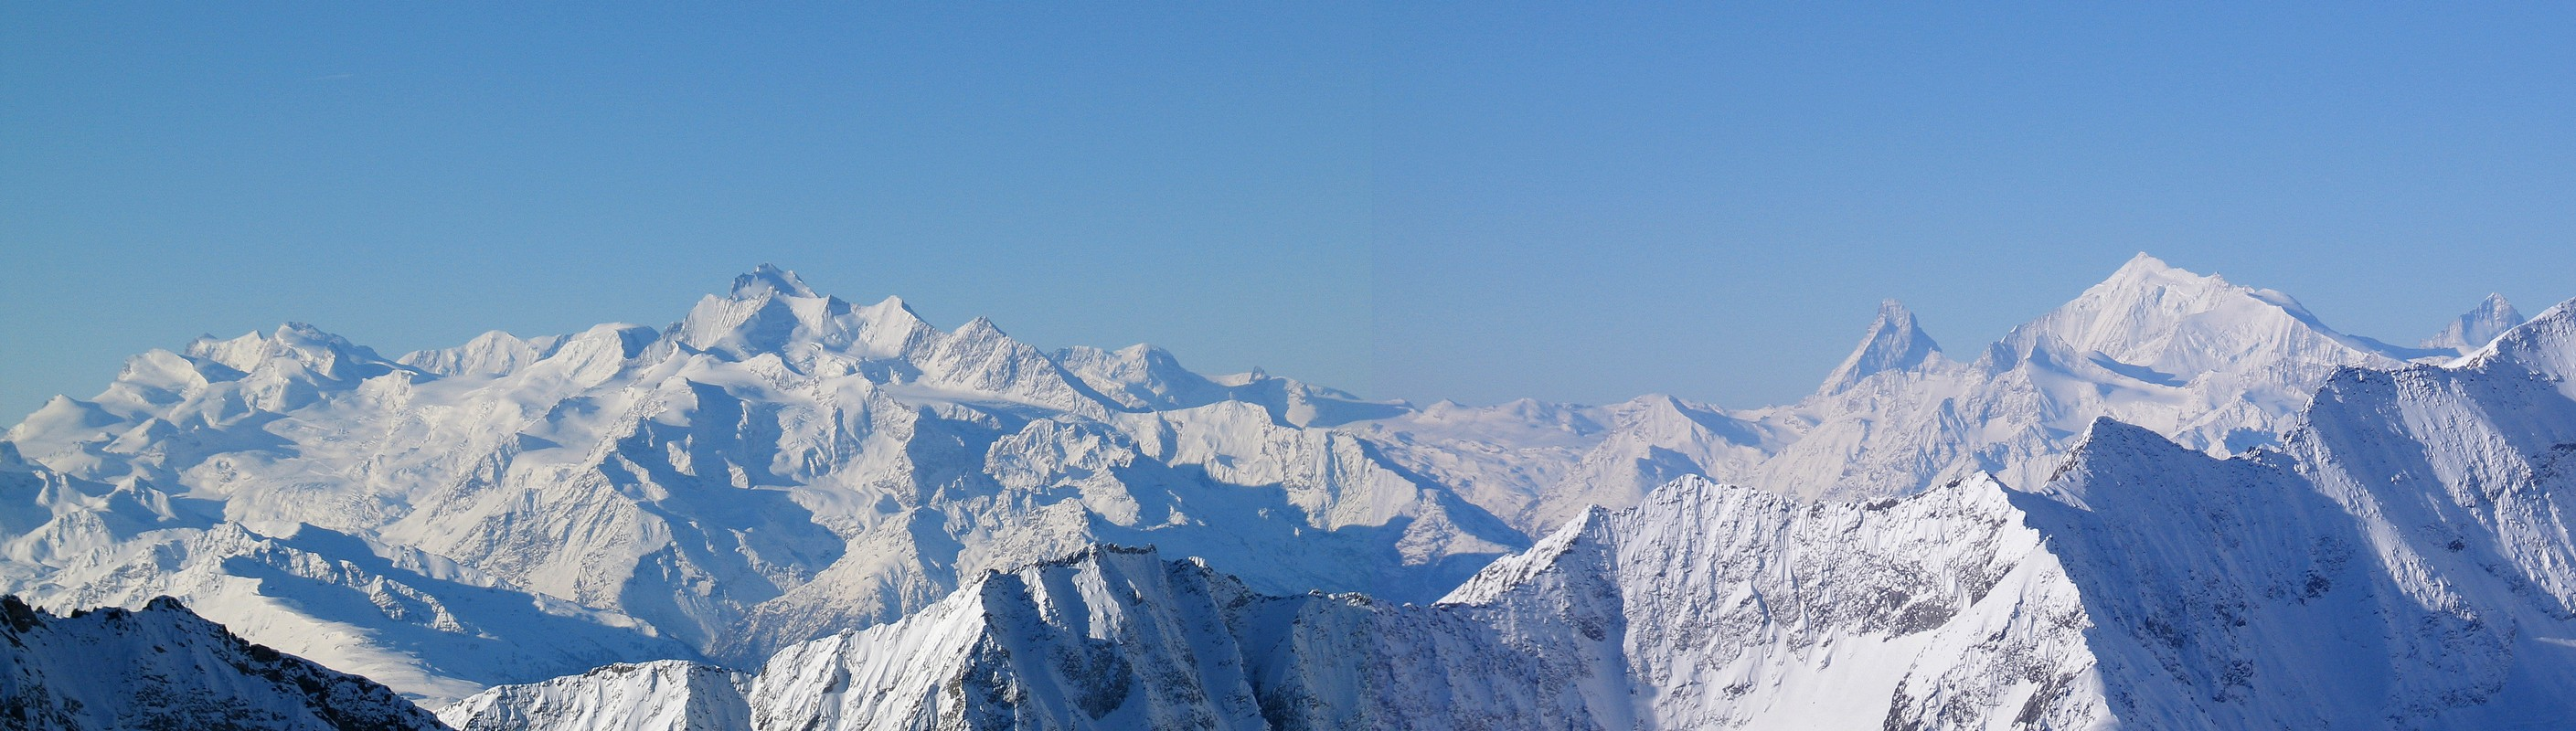 Grosser Aletschhorn Berner Alpen / Alpes bernoises Switzerland panorama 22